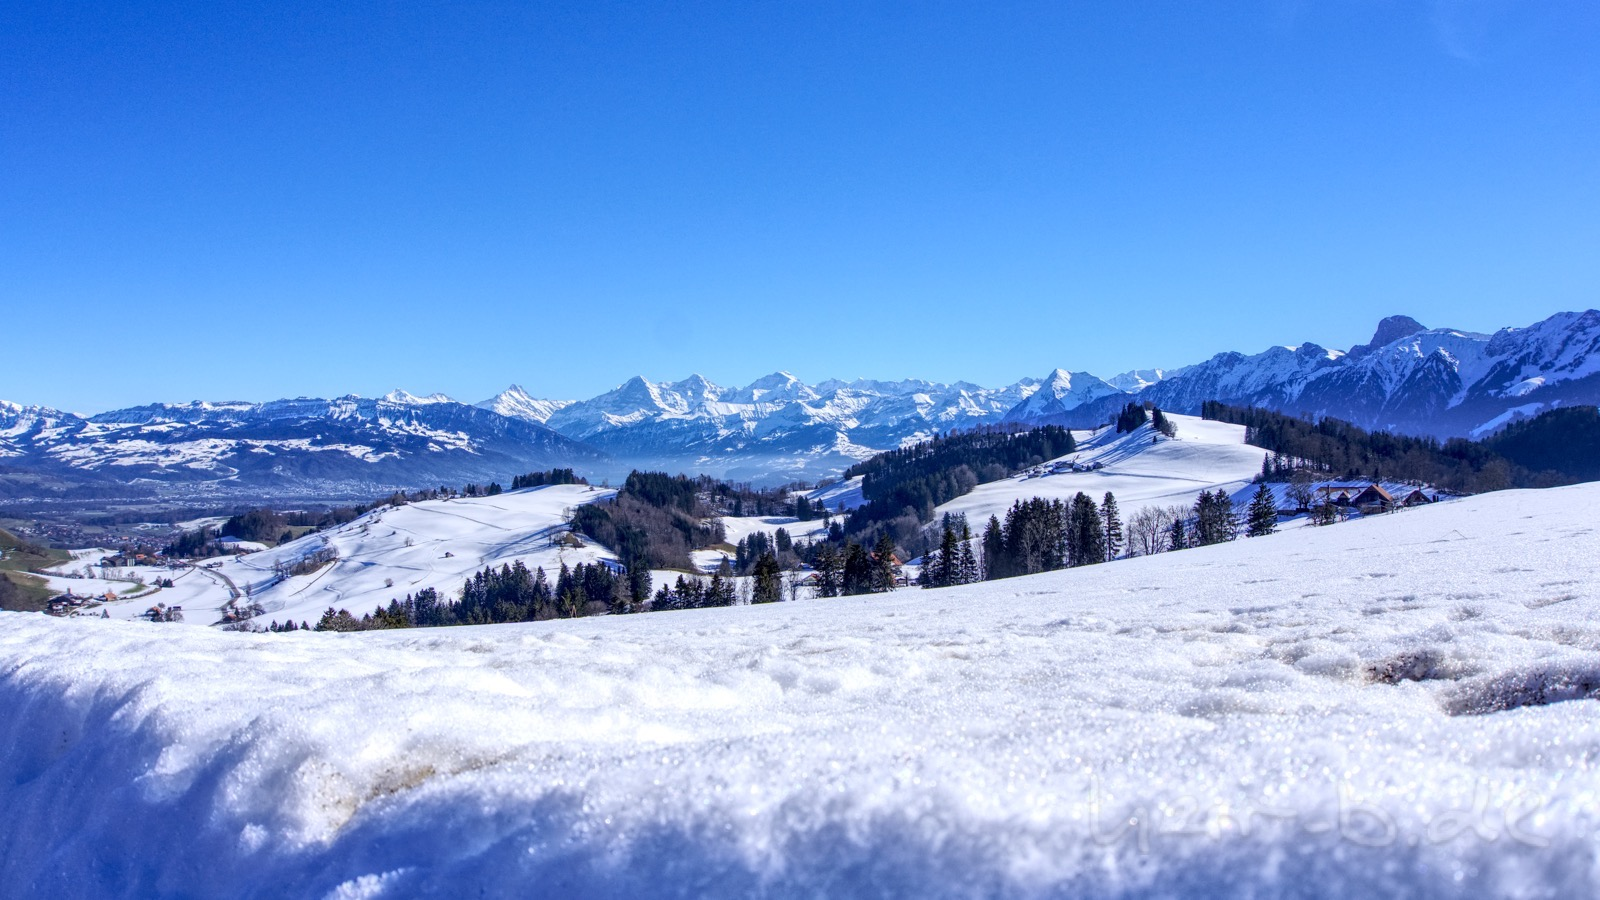 Ausblick oberhalb von Riggisberg auf das Bergpanorama.